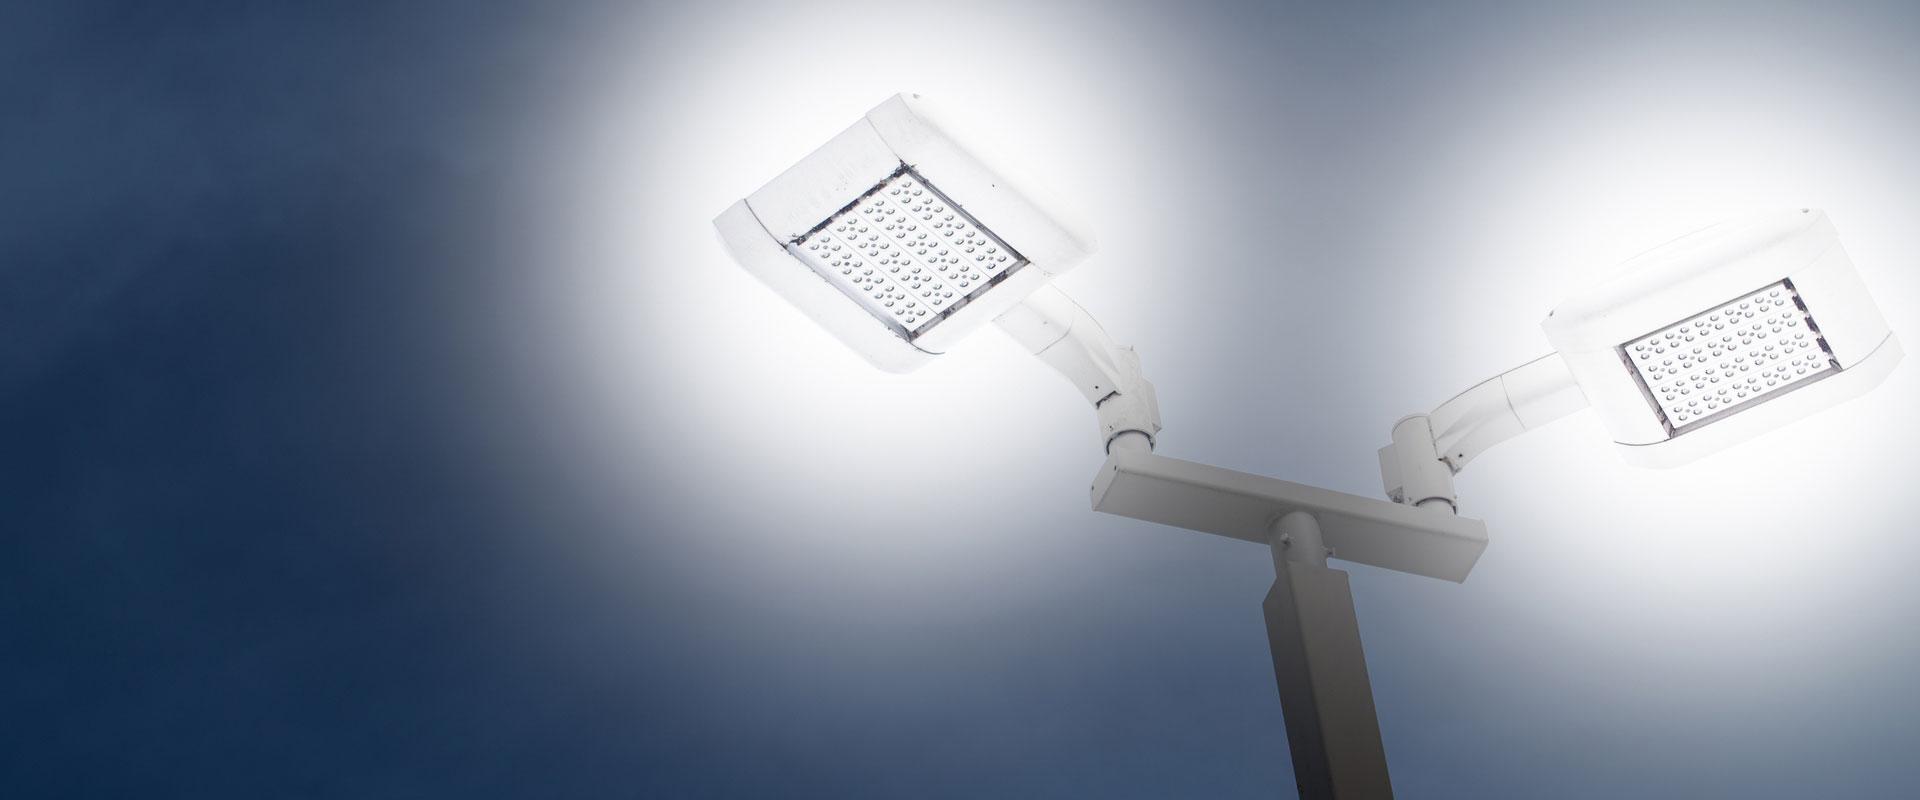 Commercial Lighting Commercial Lighting & Commercial Lighting Fastener Solutions | STANLEY Engineered Fastening